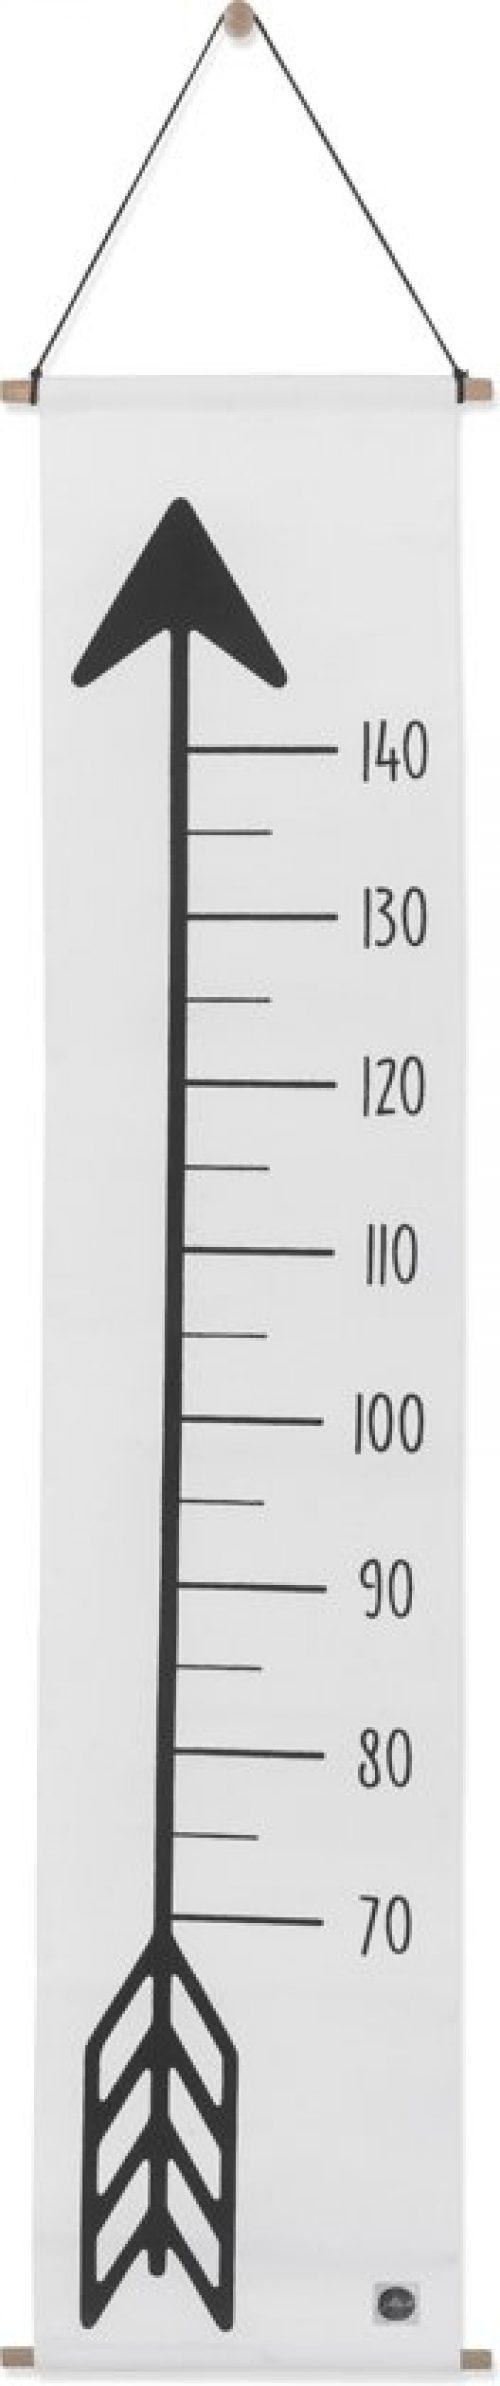 Groeimeter 70-140cm canvas Indians